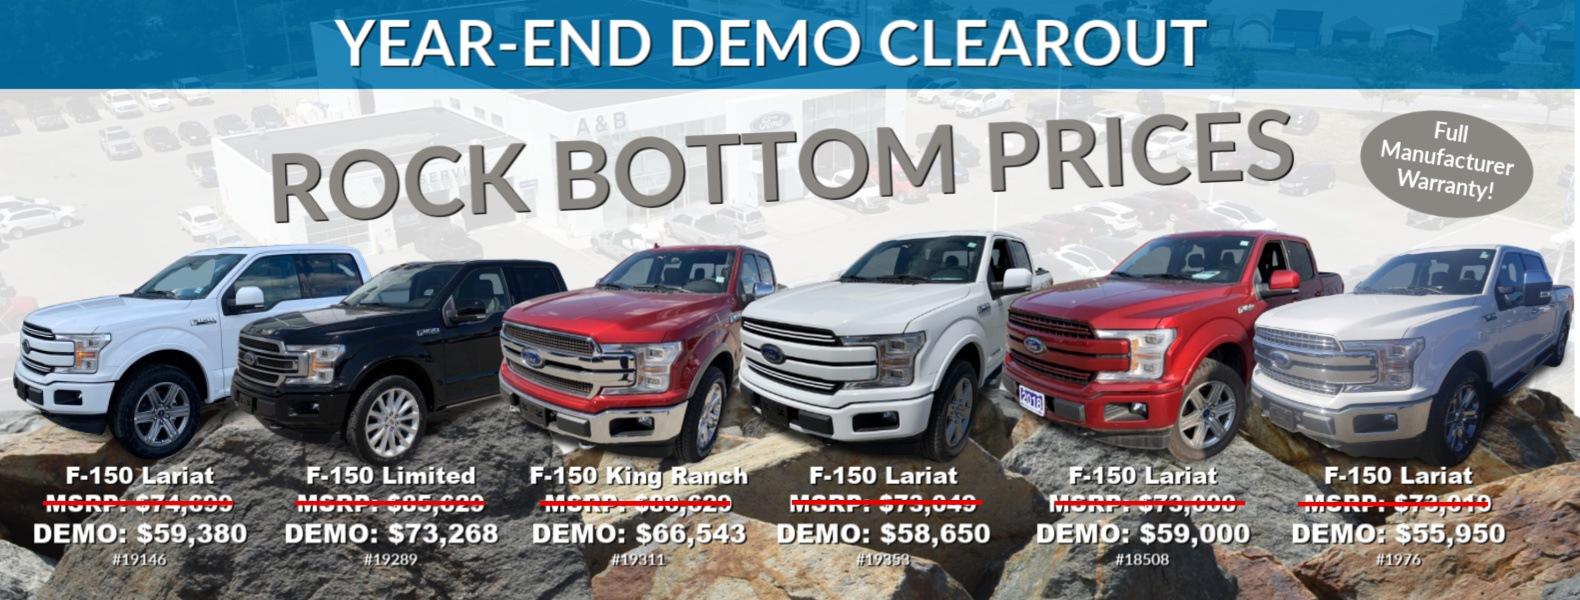 Ford Demonstrator DEMO Vehicles